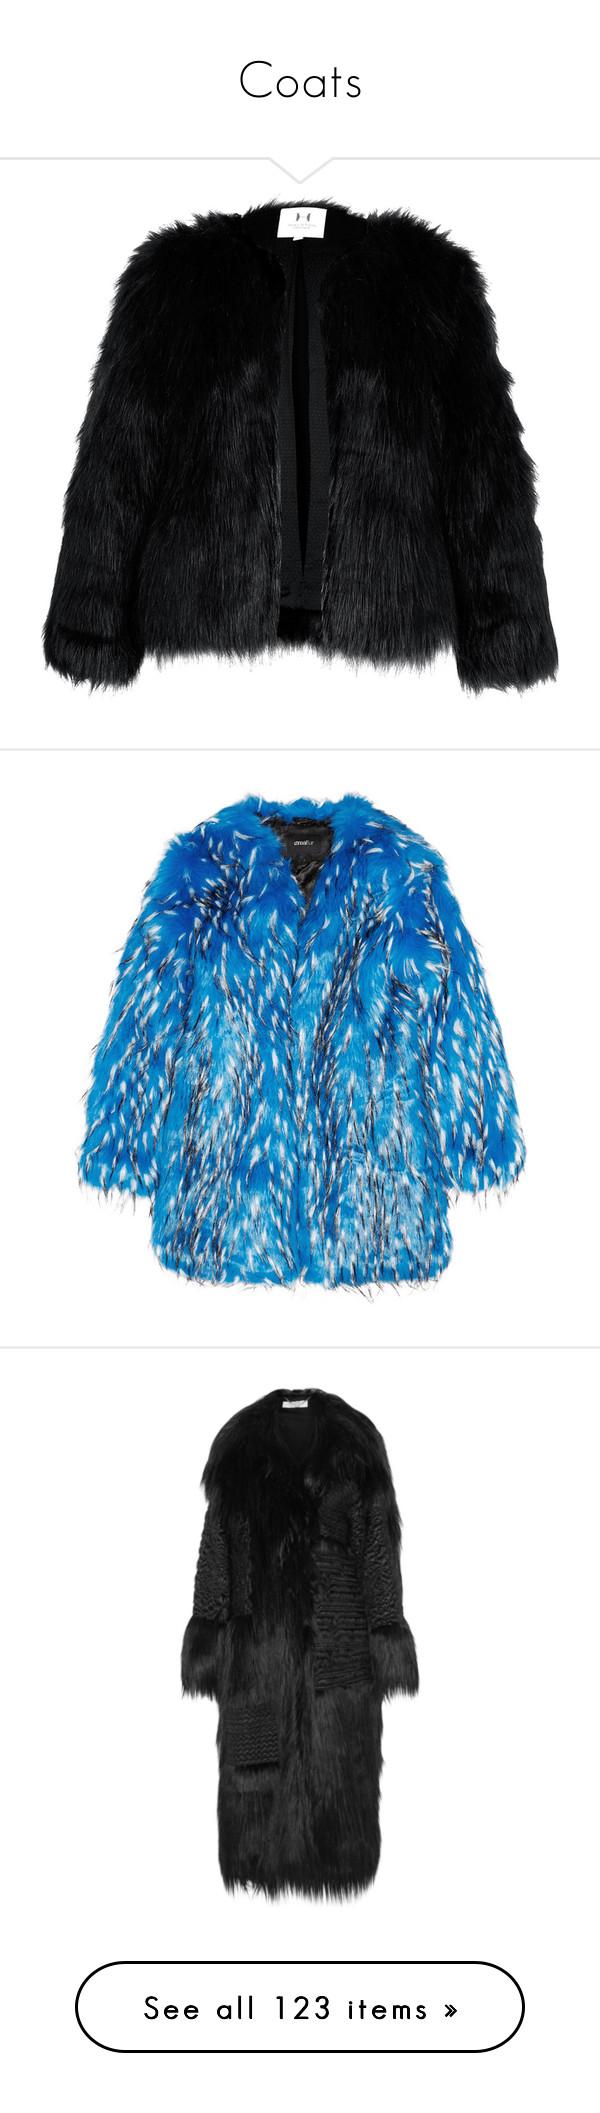 """Coats"" by deborahsauveur ❤ liked on Polyvore featuring outerwear, coats, jackets, fur, women, women's tops, womenswear, black coat, halston heritage coat and fur coat"